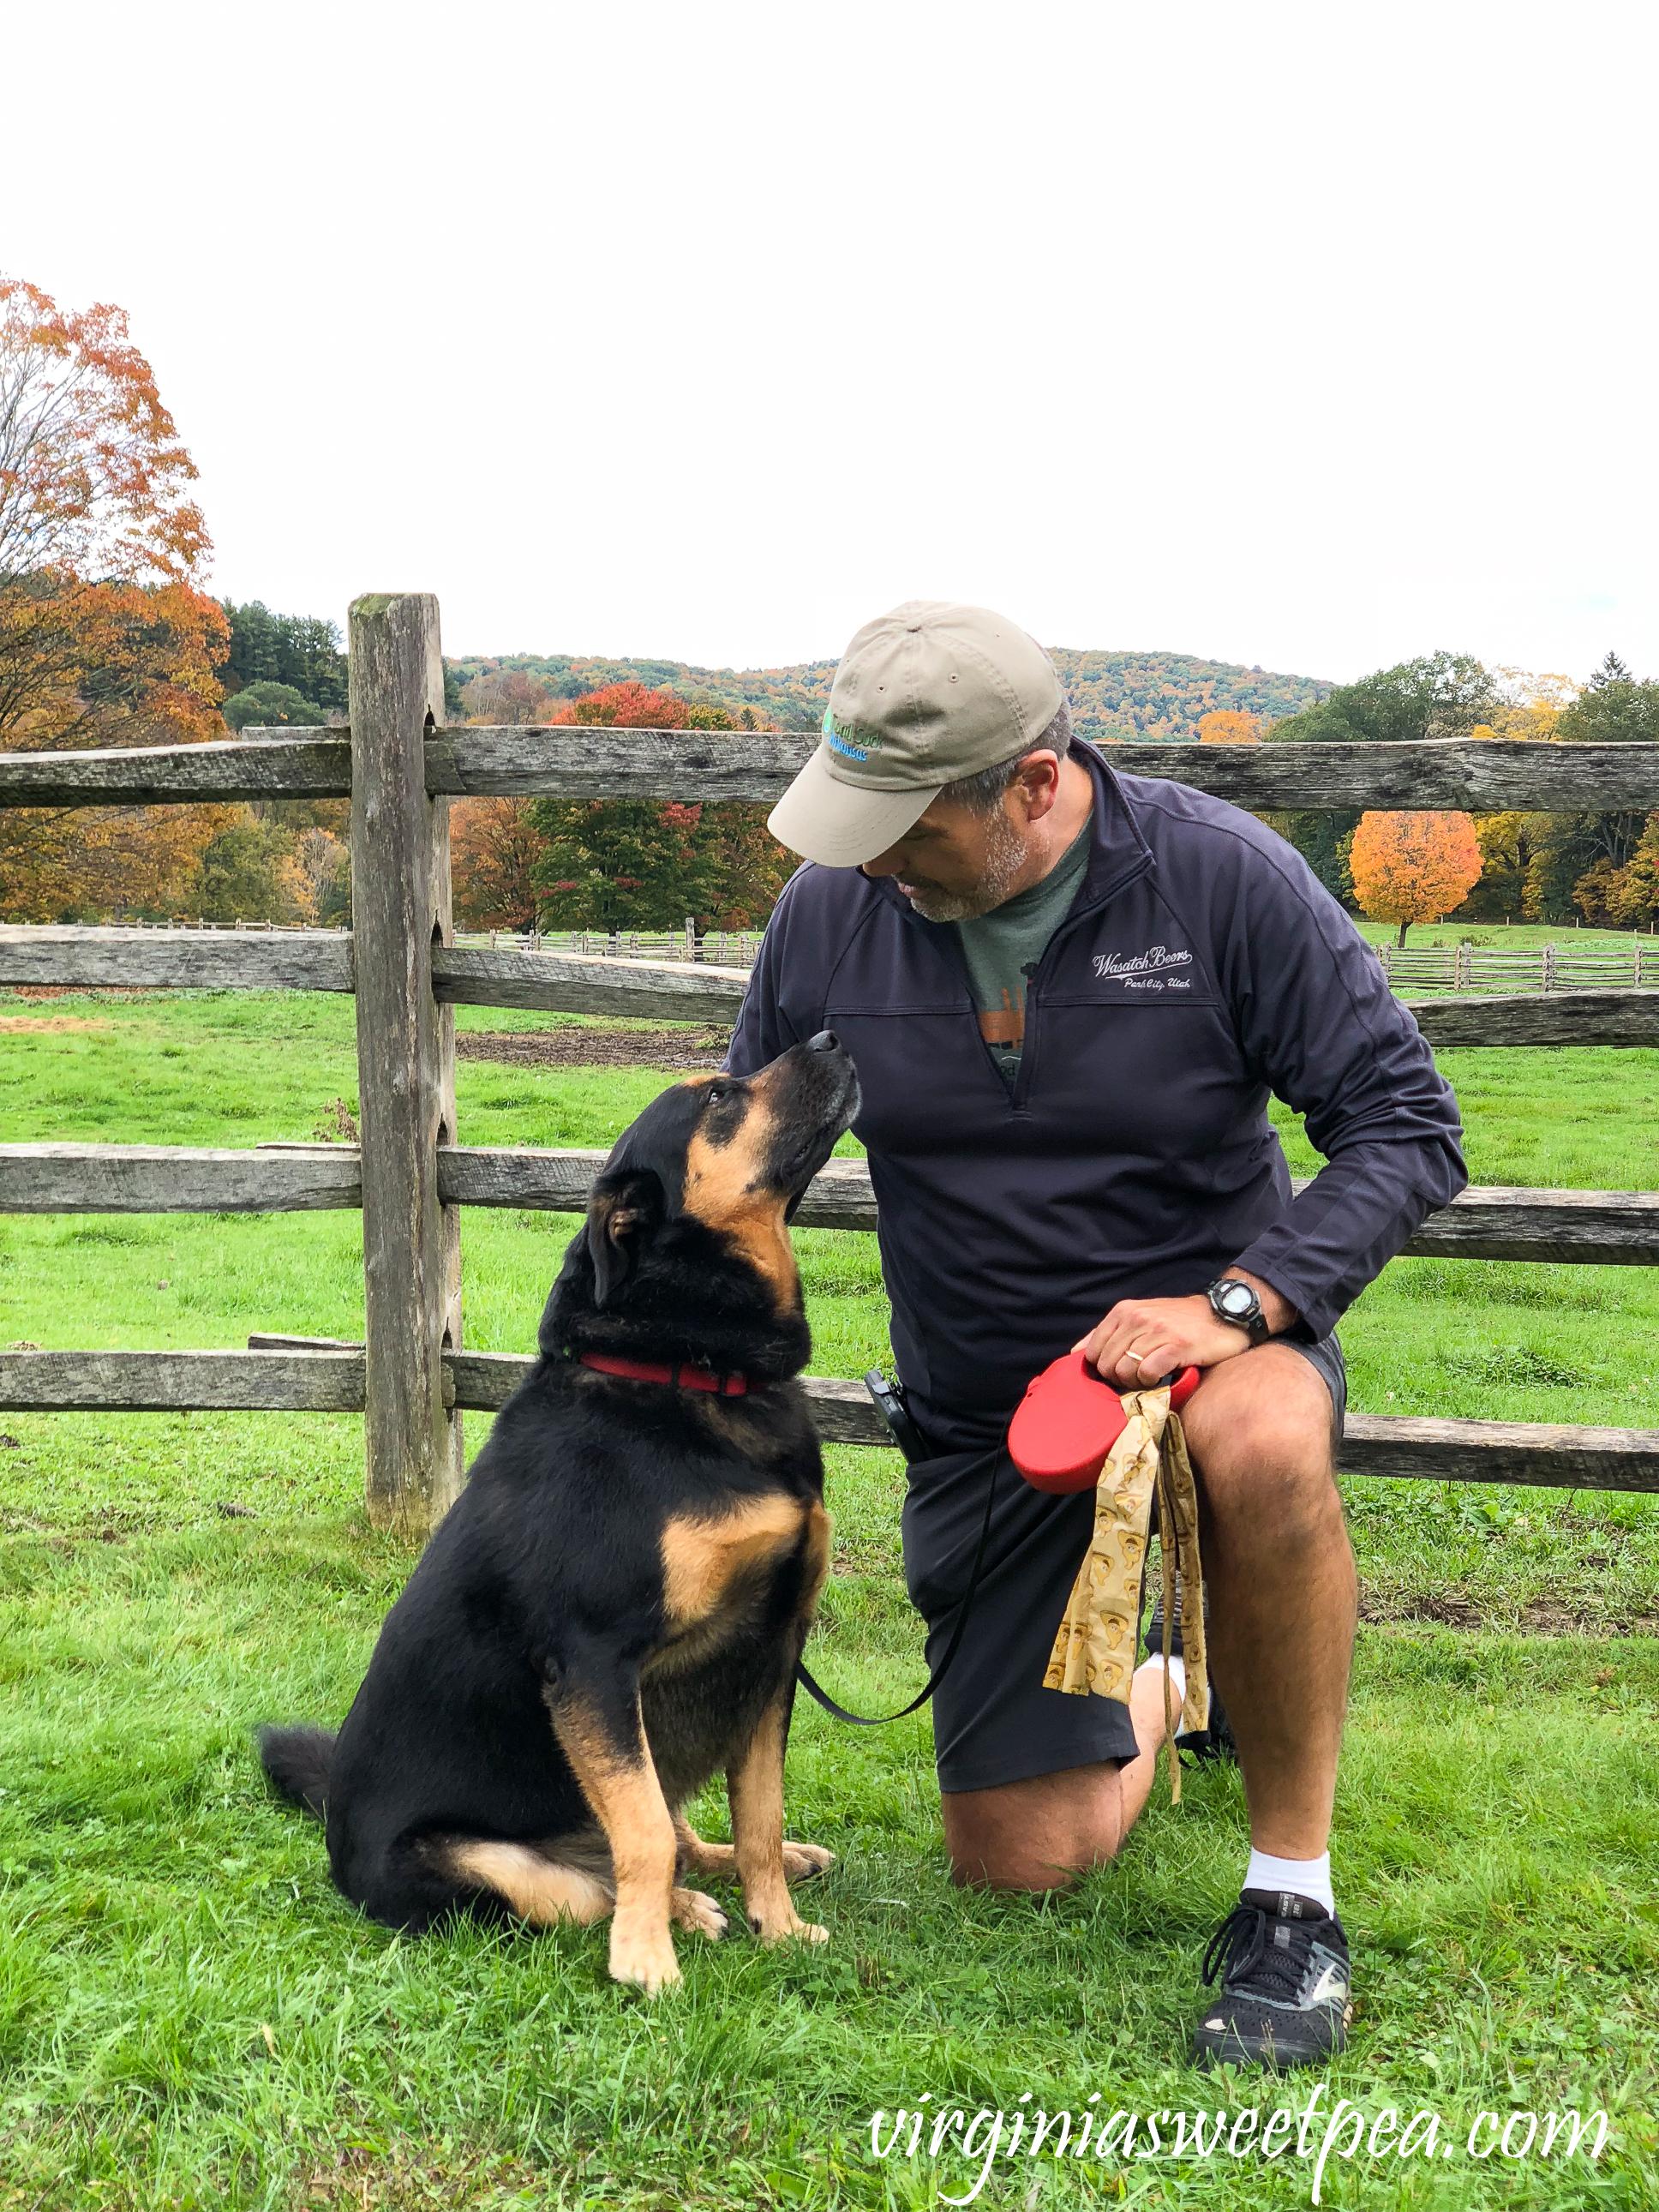 Sherman Skulina enjoying Vermont in Fall #shermanskulina #vermont #vermontfall